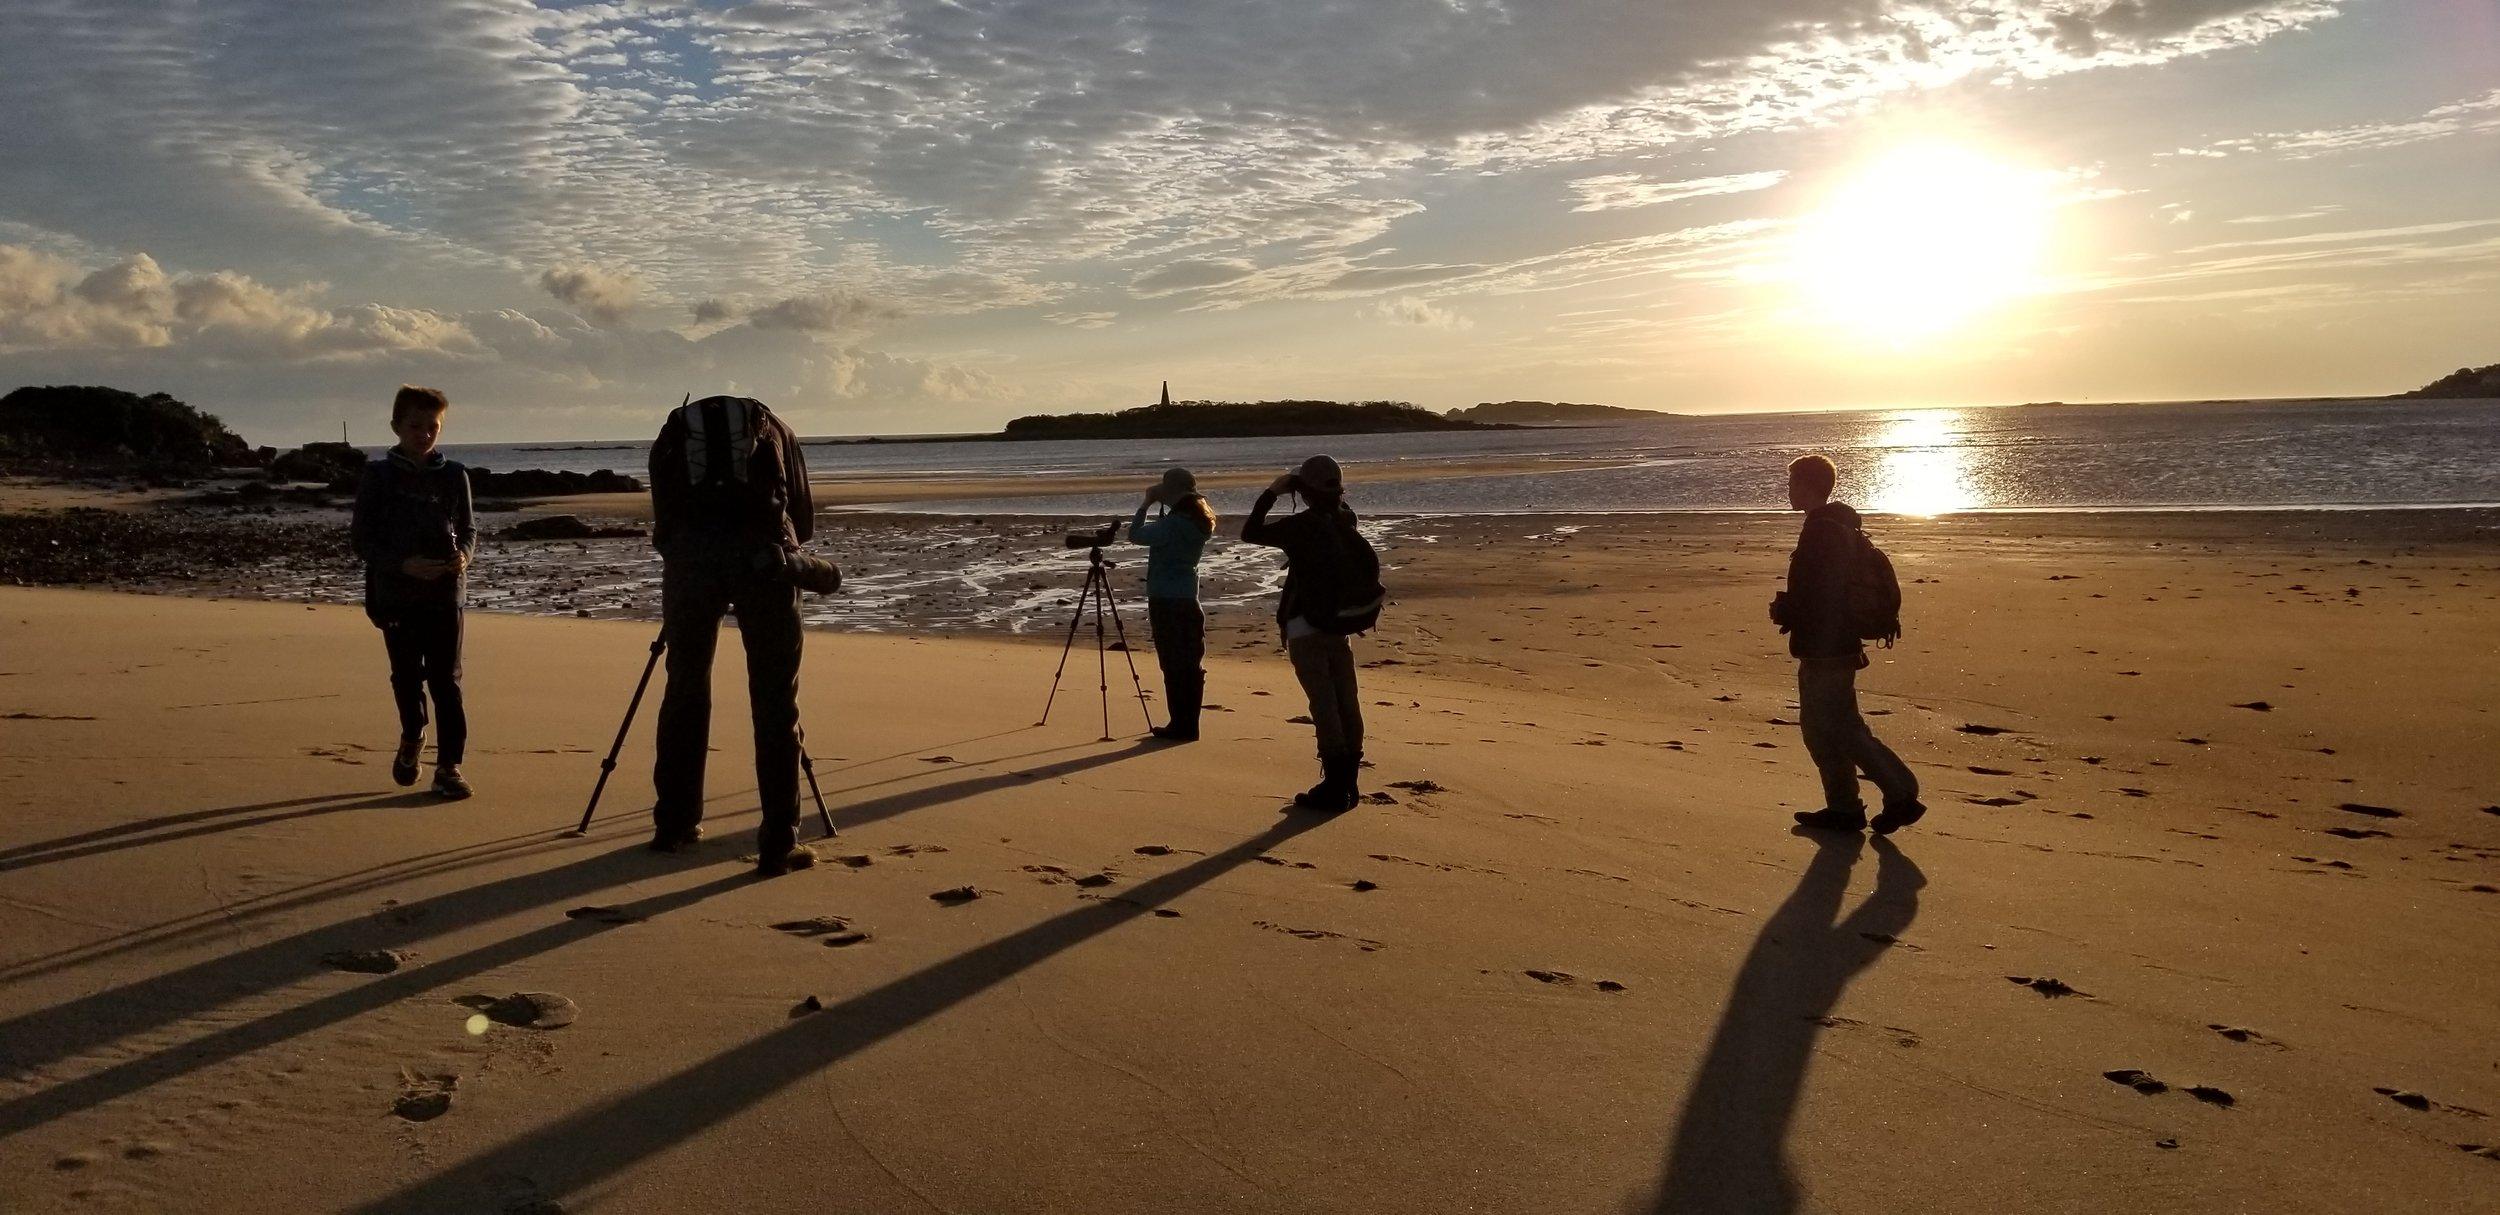 Scanning for shorebirds at sunrise